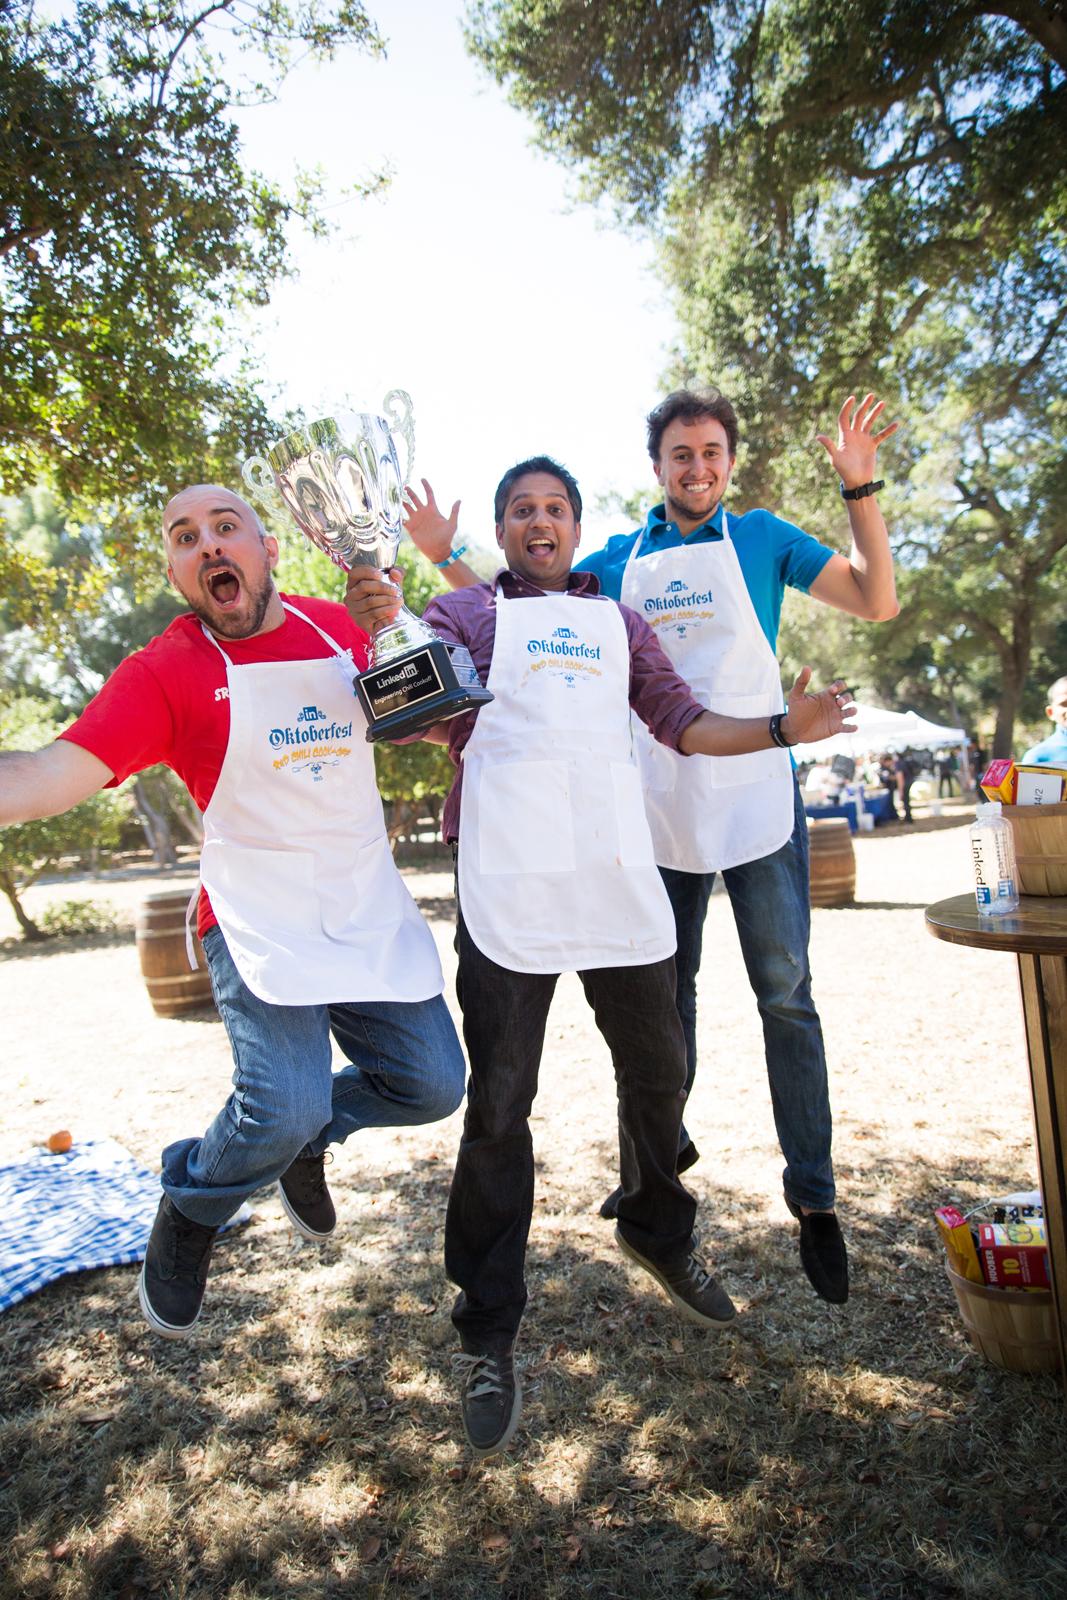 Joey Addona, Matthew Turco, and Laukik Watve take home the top prize with their Triple B chili